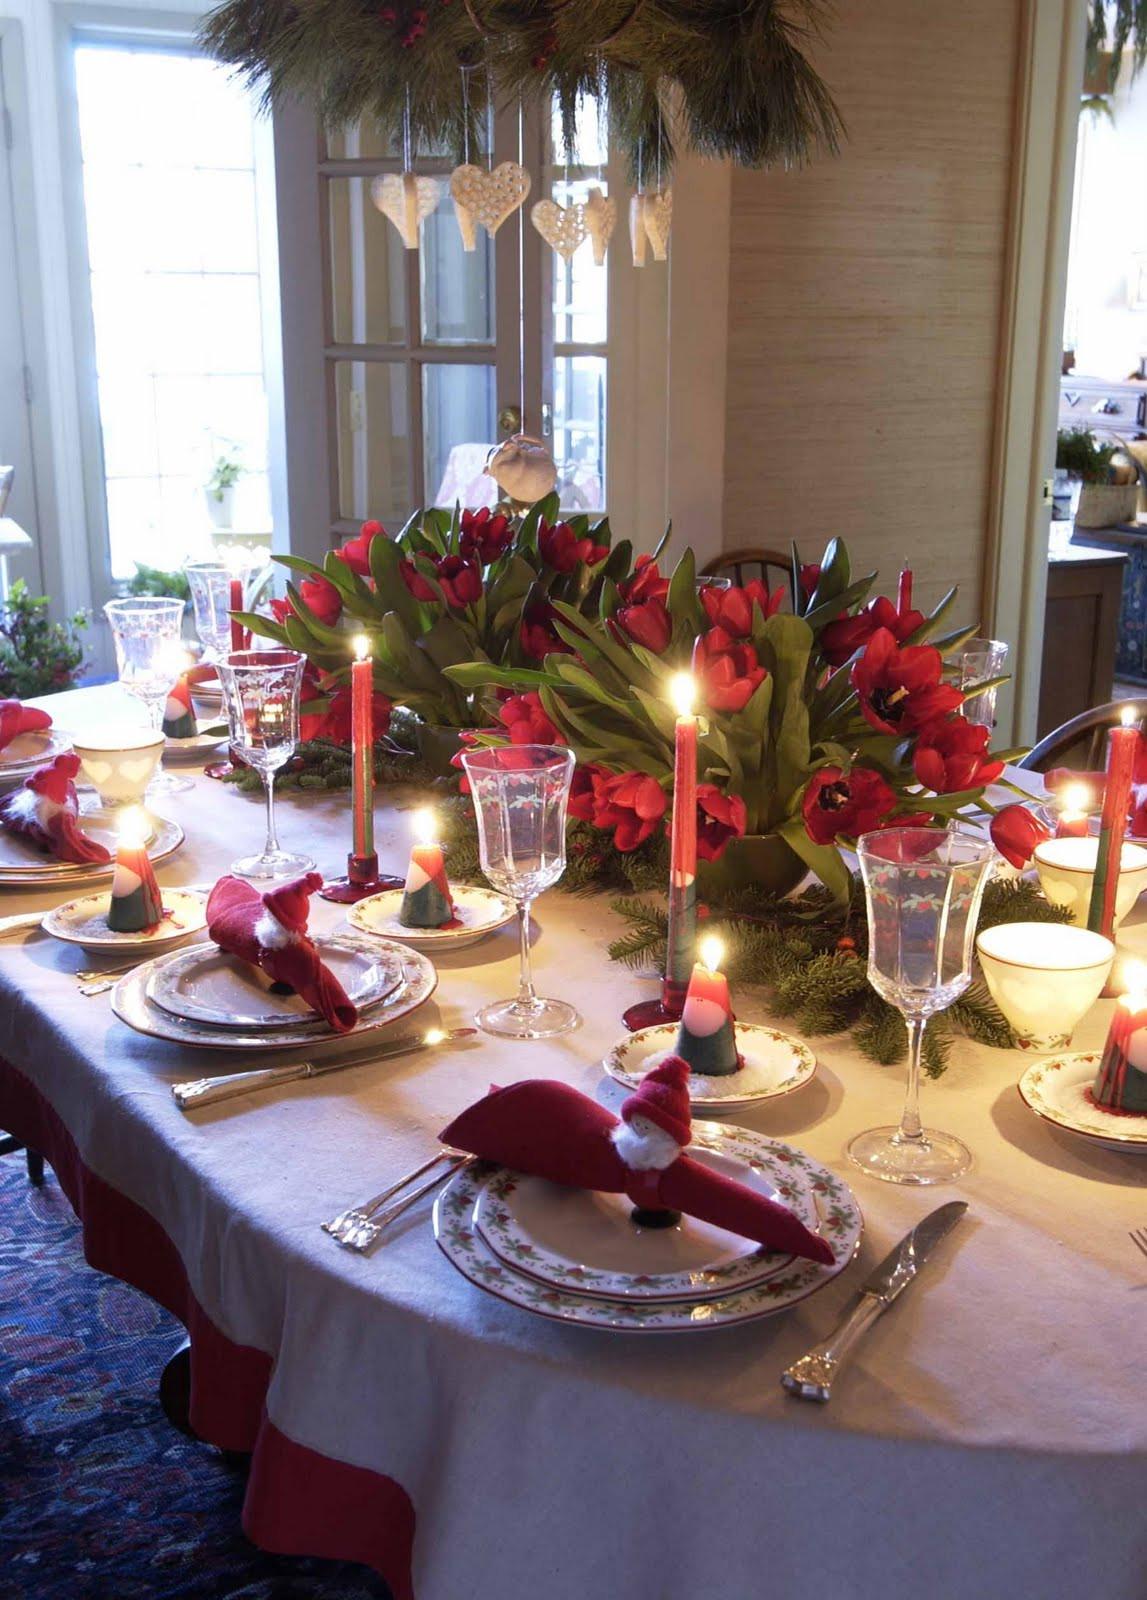 Christmas Dinner Table  5 Christmas Table Decorations